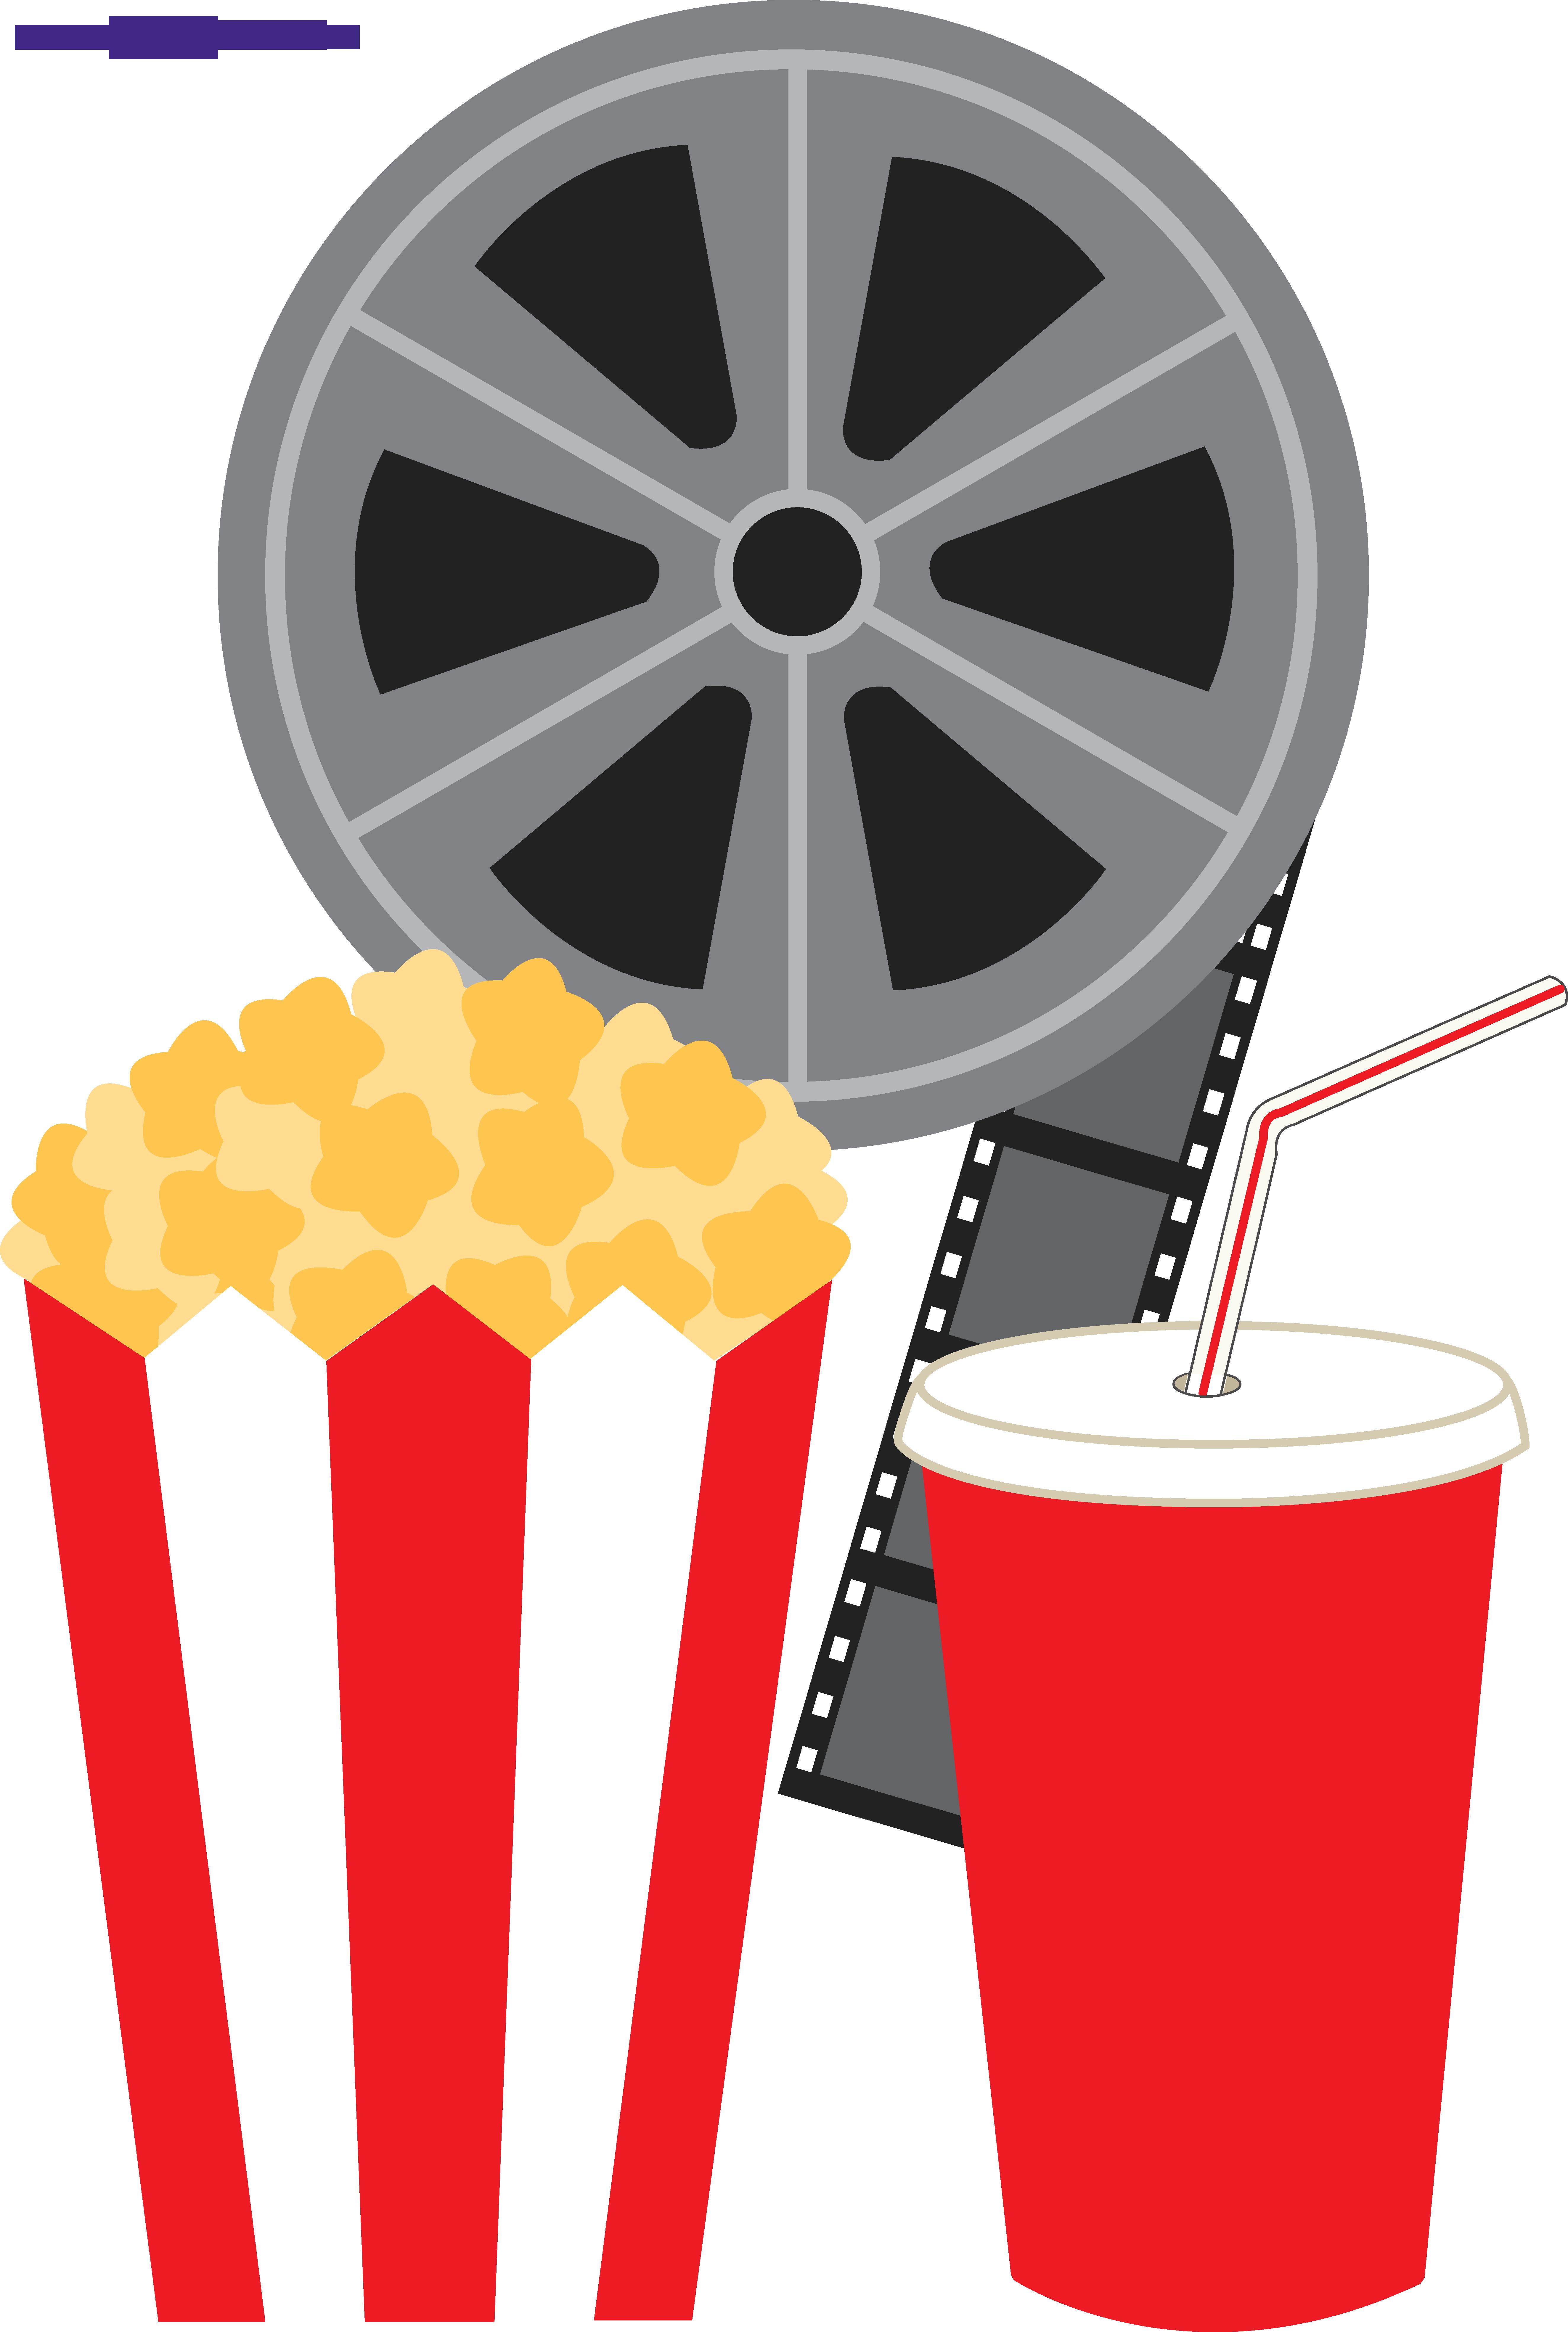 Popcorn Soda and Movie Clipart.